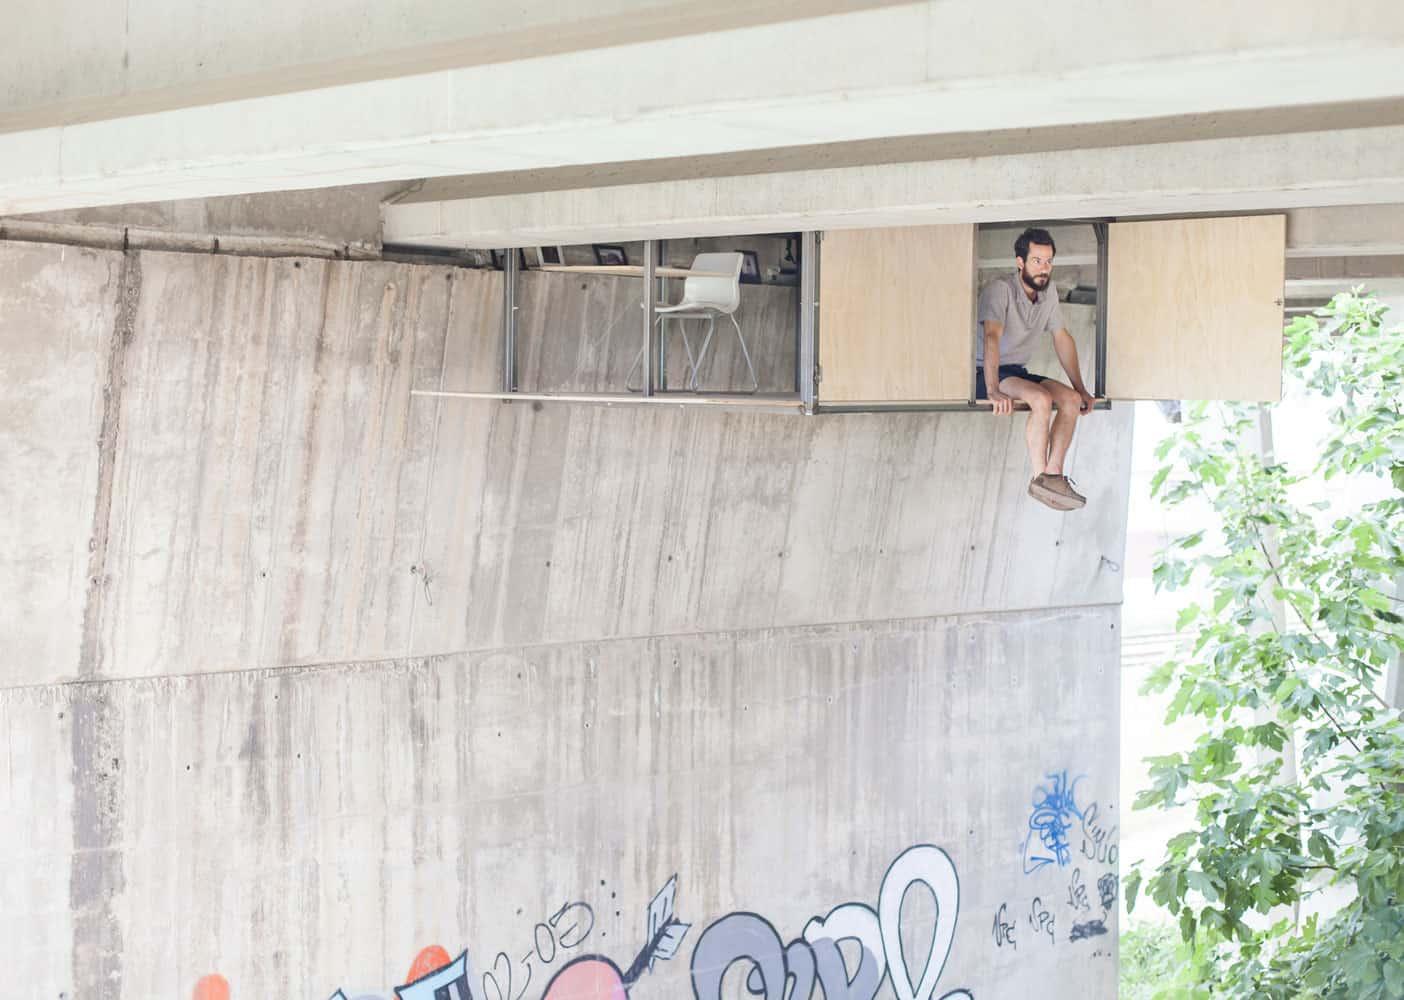 Fernando Abellanas Designed a Small Studio Hidden Under a Bridge in the City of Valencia, Spain